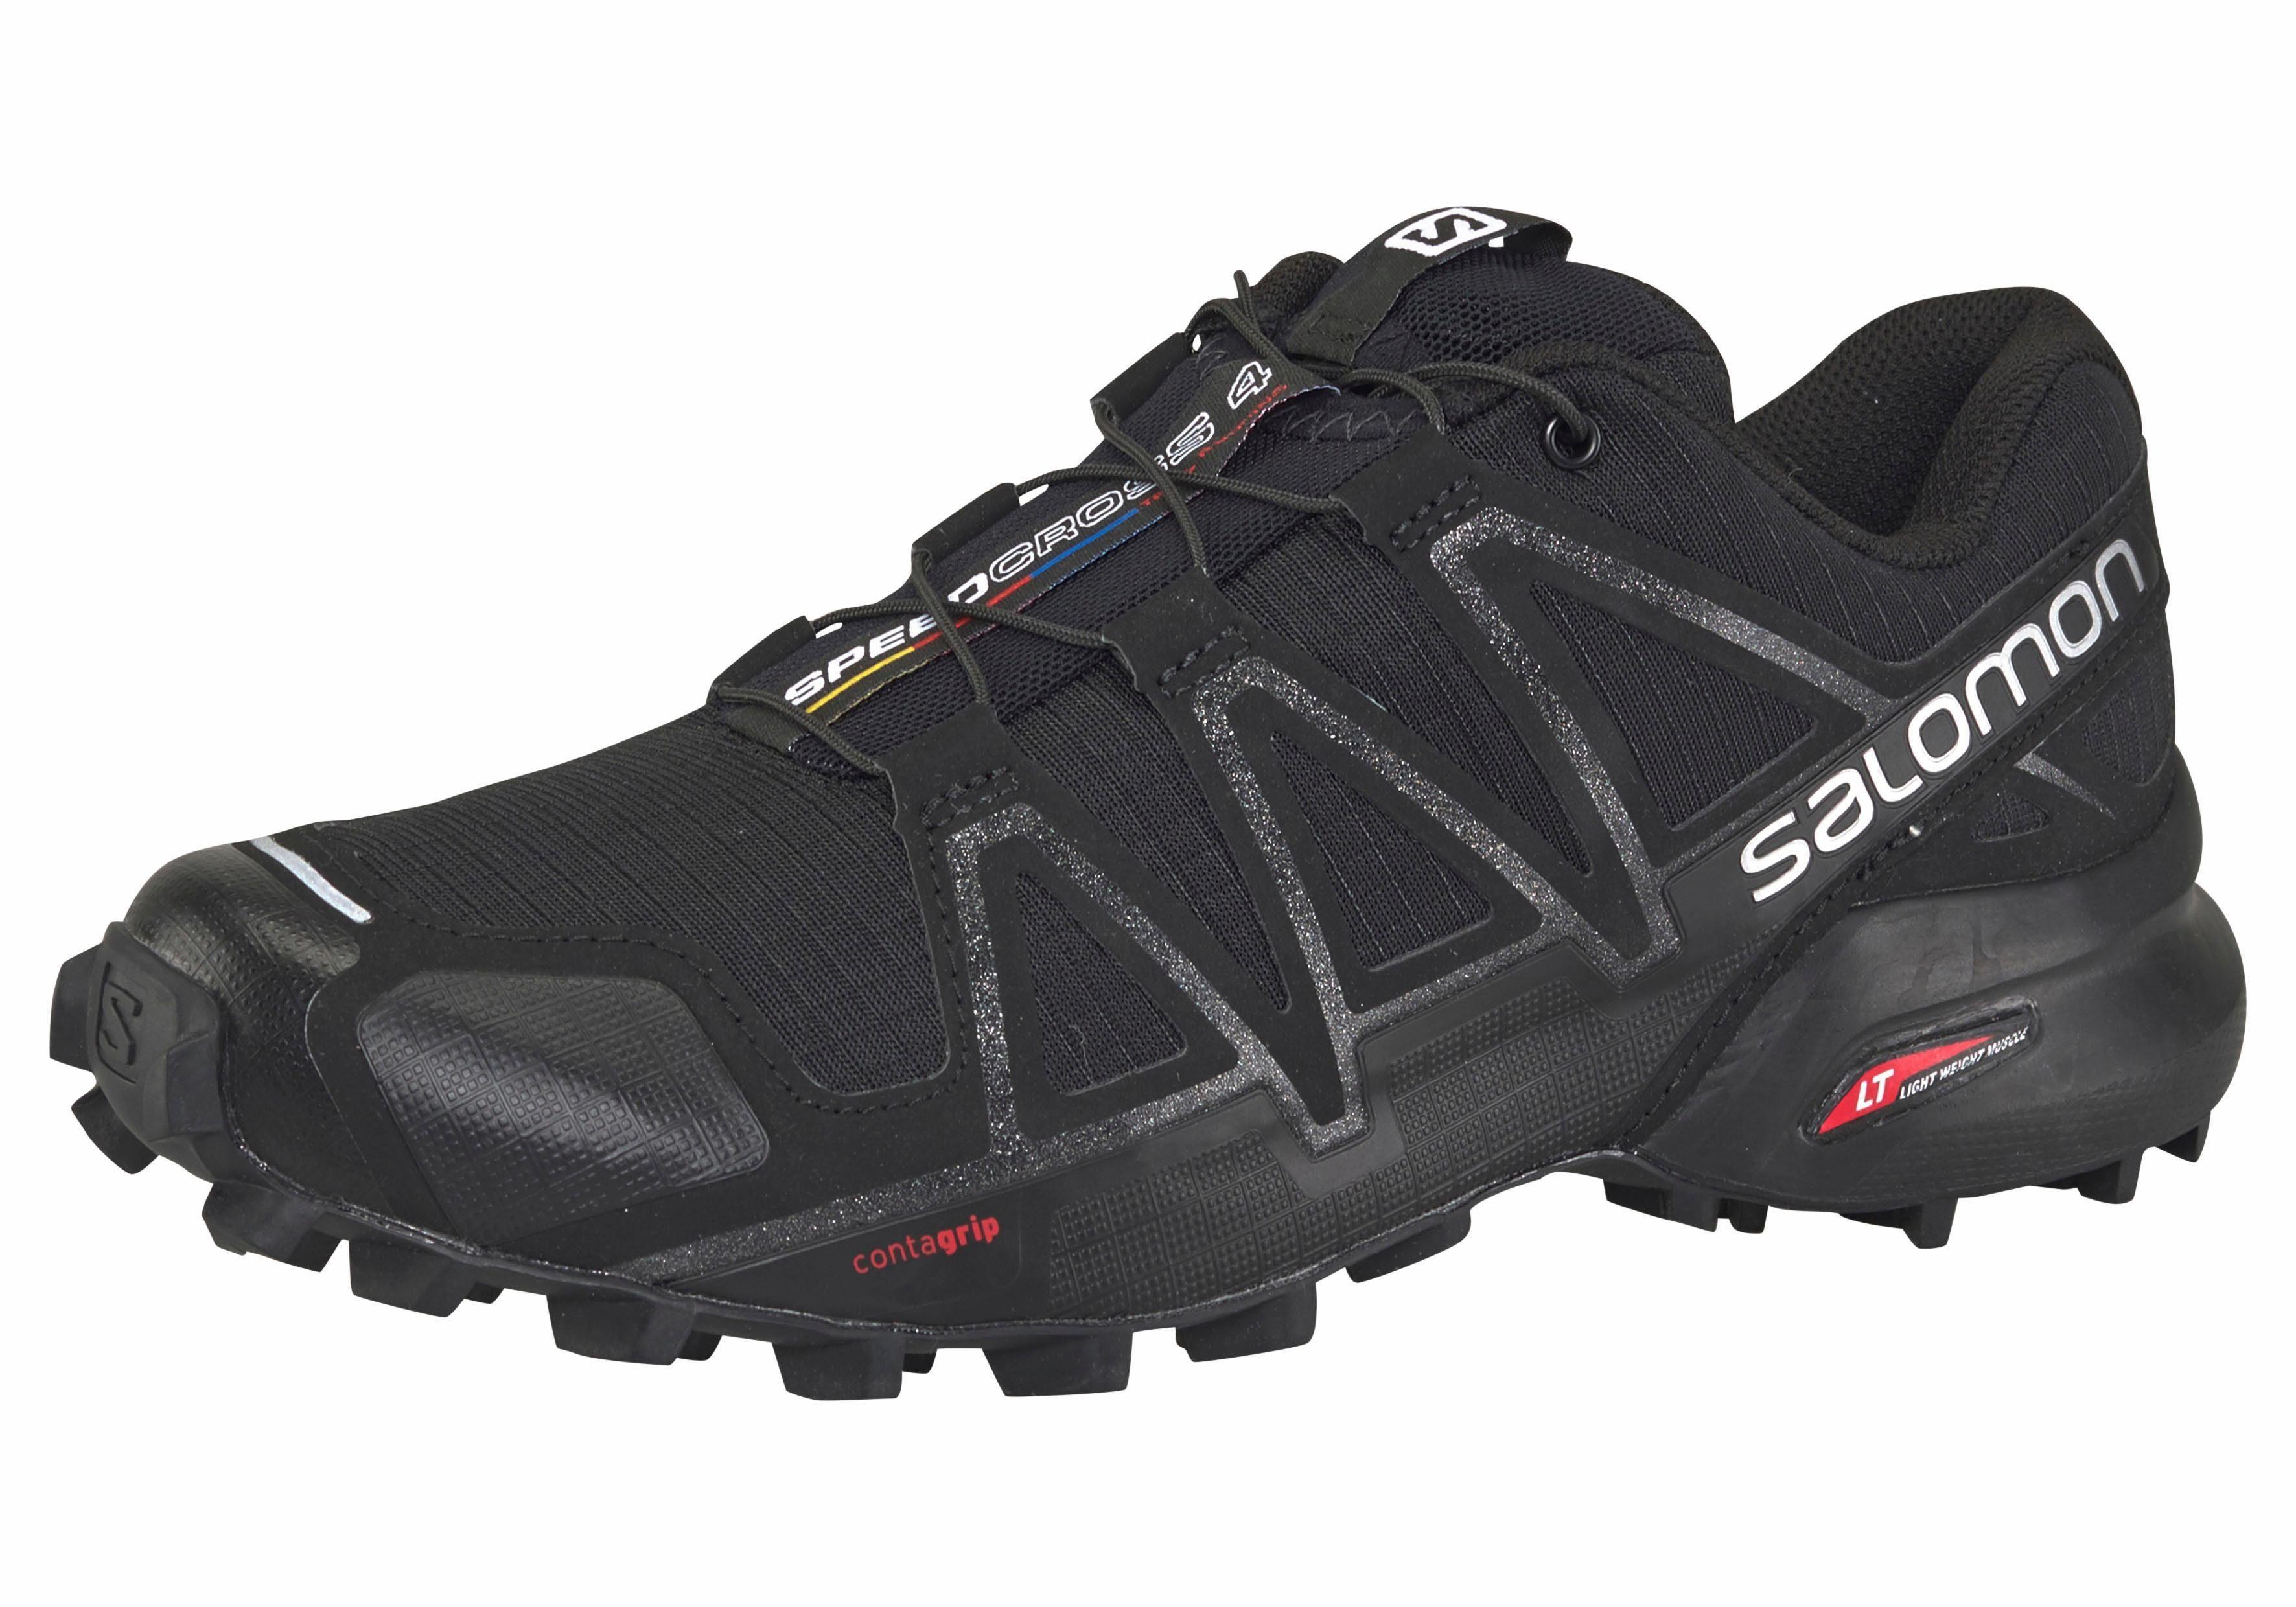 Damen Salomon »Speedcross 4 W« Laufschuh blau, schwarz | 00889645080659